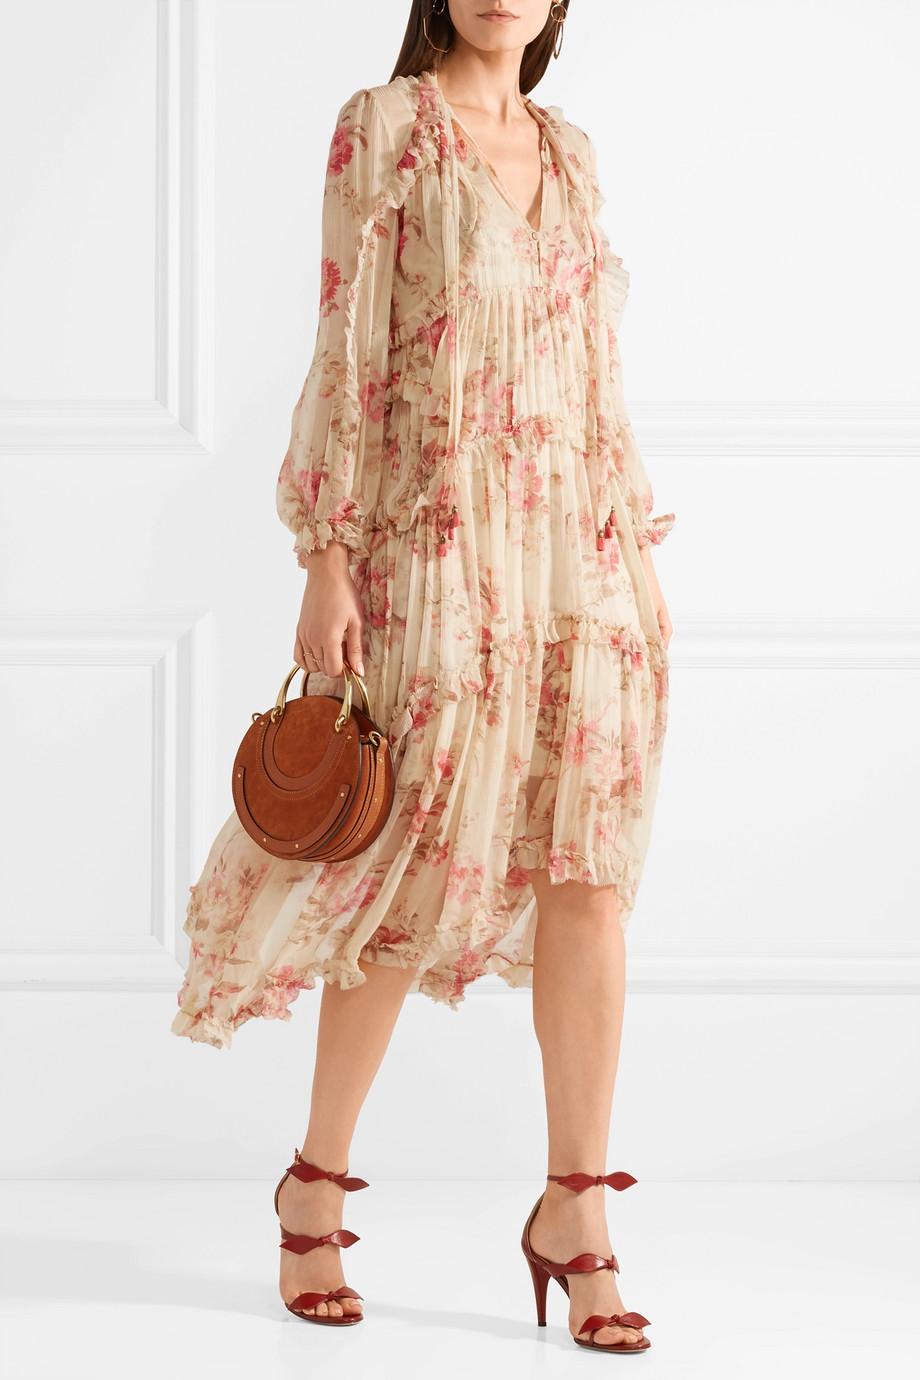 Zimmerman Cosair Floral Ruffled Dress